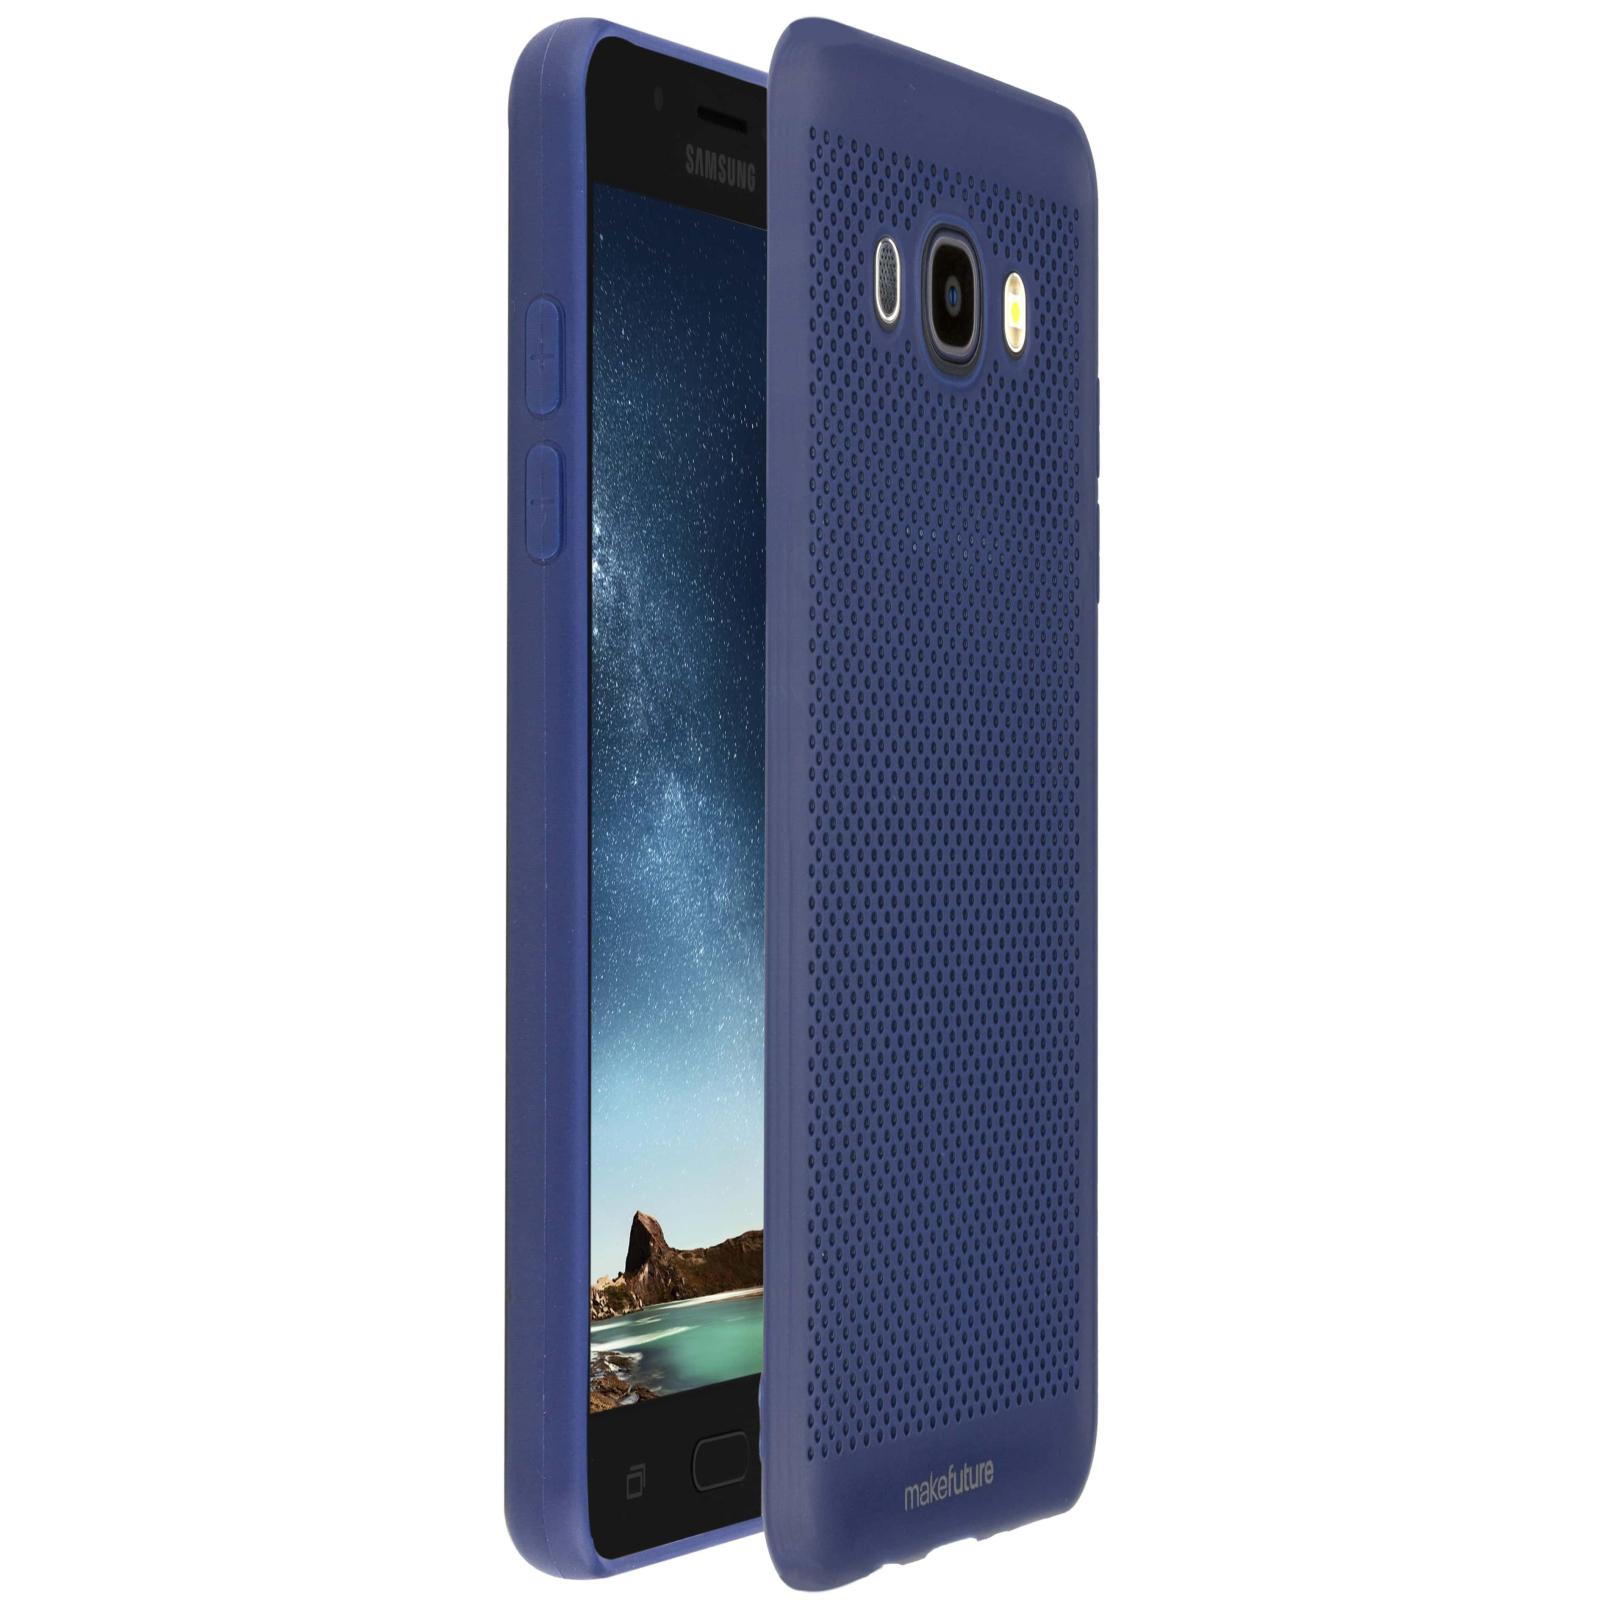 Чехол для моб. телефона MakeFuture Moon Case (TPU) для Samsung J5 2016 (J510) Blue (MCM-SJ510BL) изображение 2